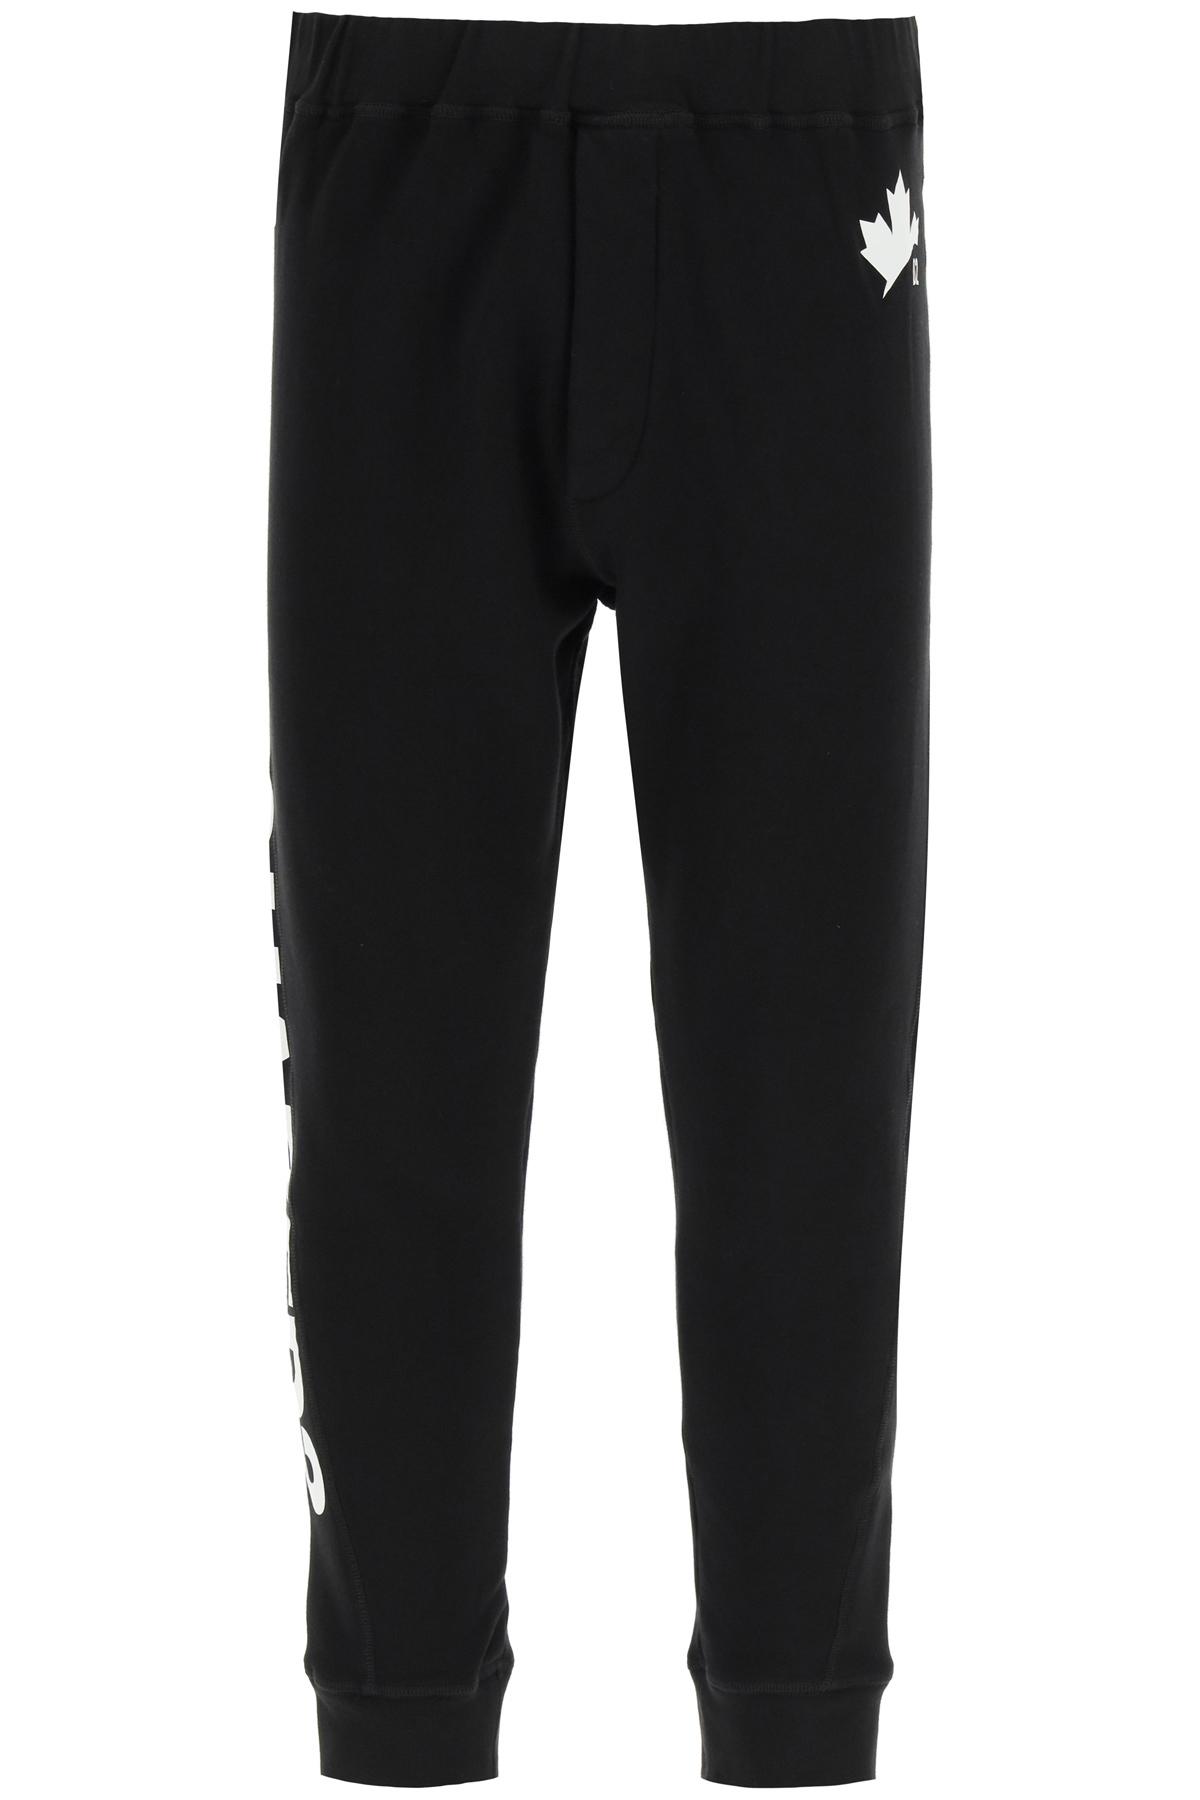 Dsquared2 pantaloni jogger con stampa d2 leaf